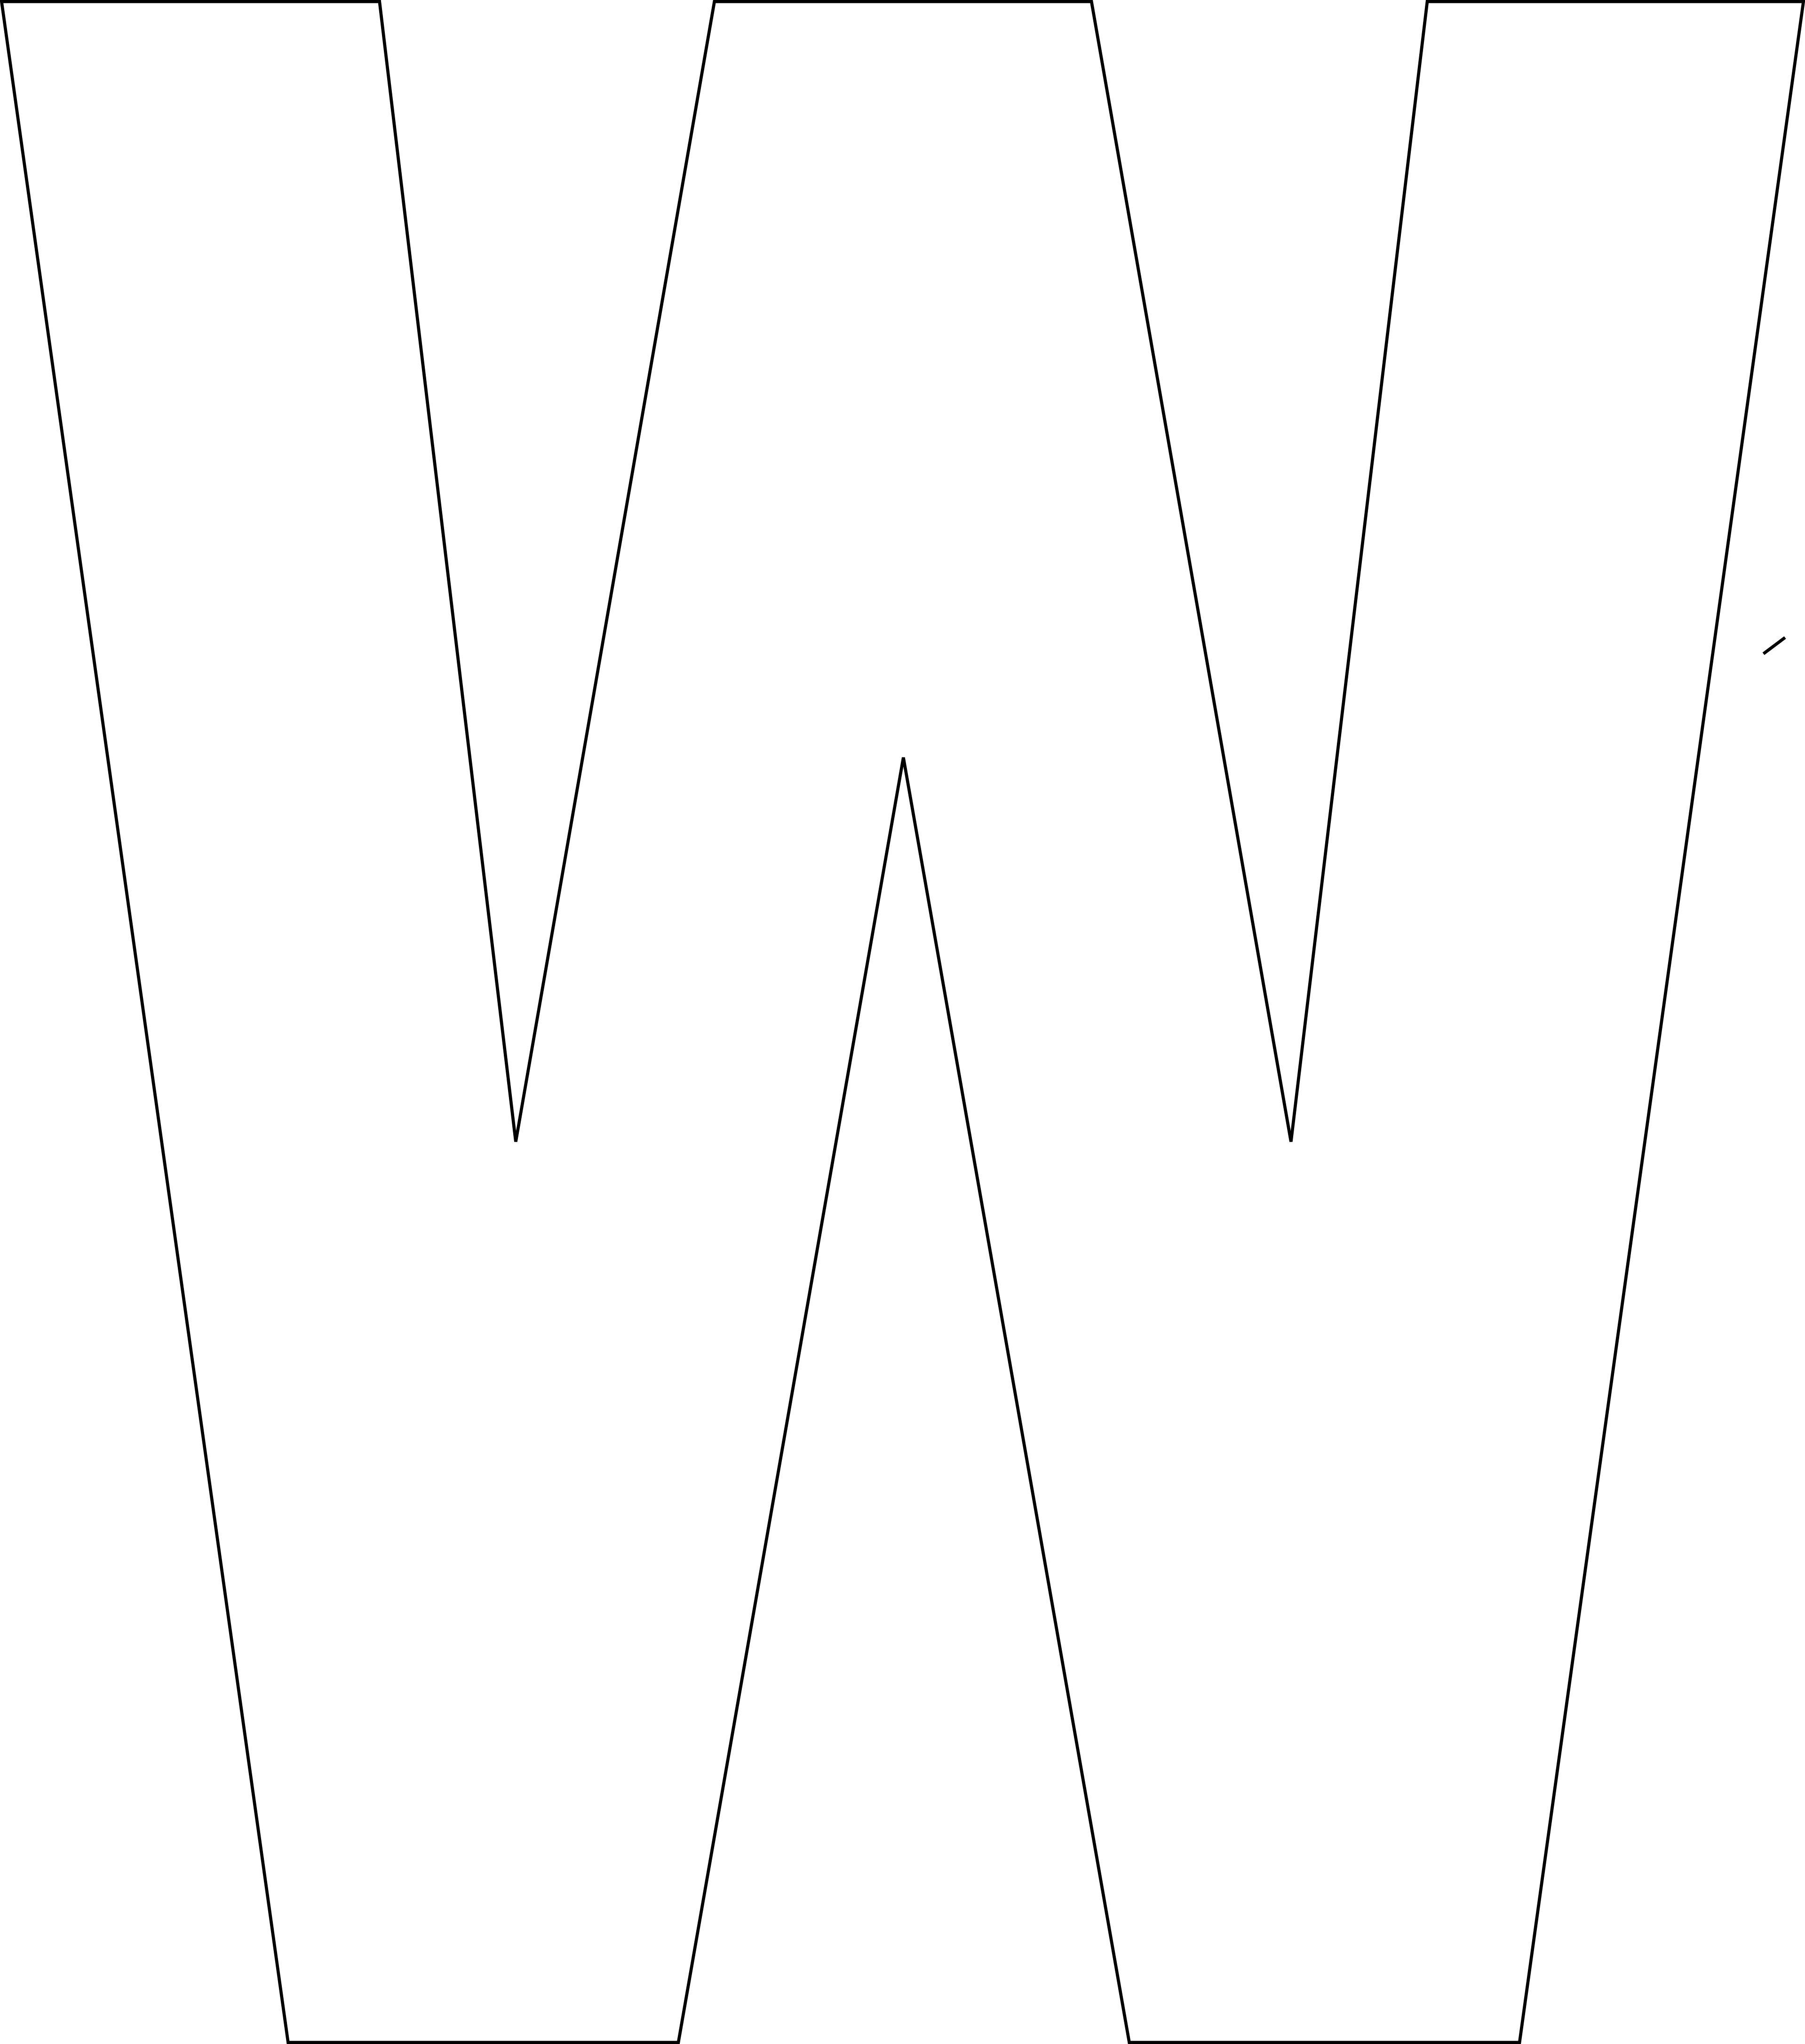 Free Printable Alphabet Template Upper Case - Template Letters Of The Alphabet For Free Printable